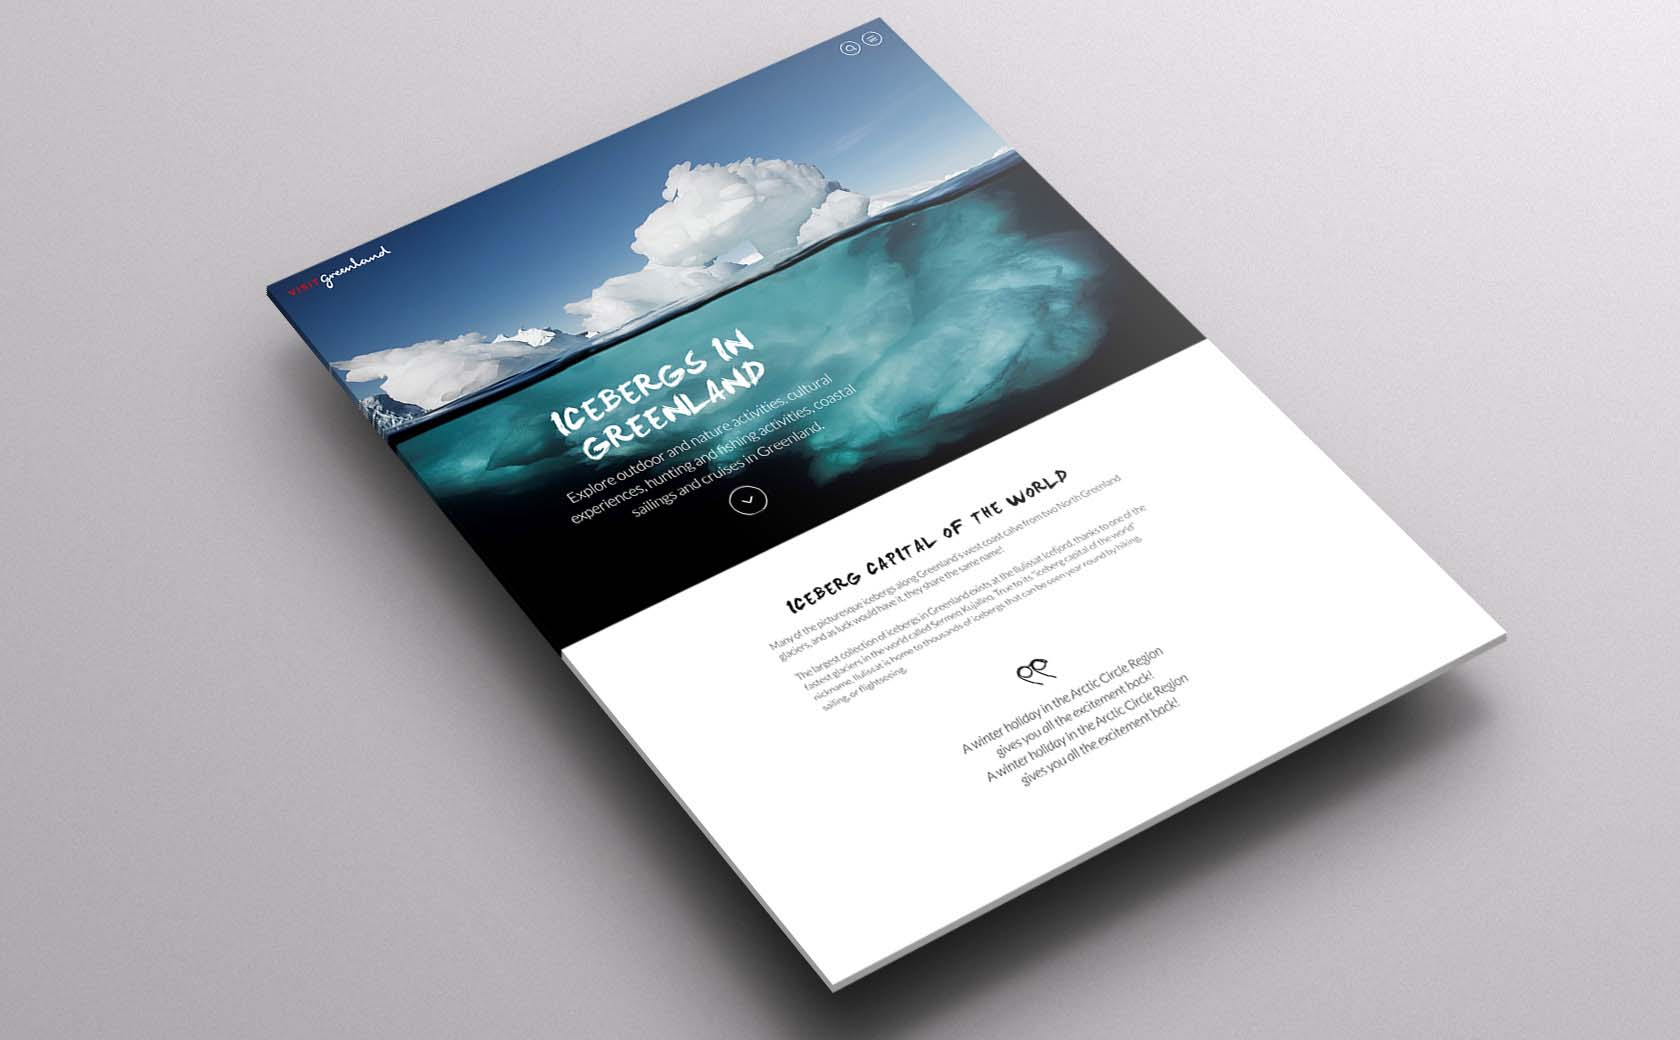 Visitgreenland_iPad-flow_C.jpg